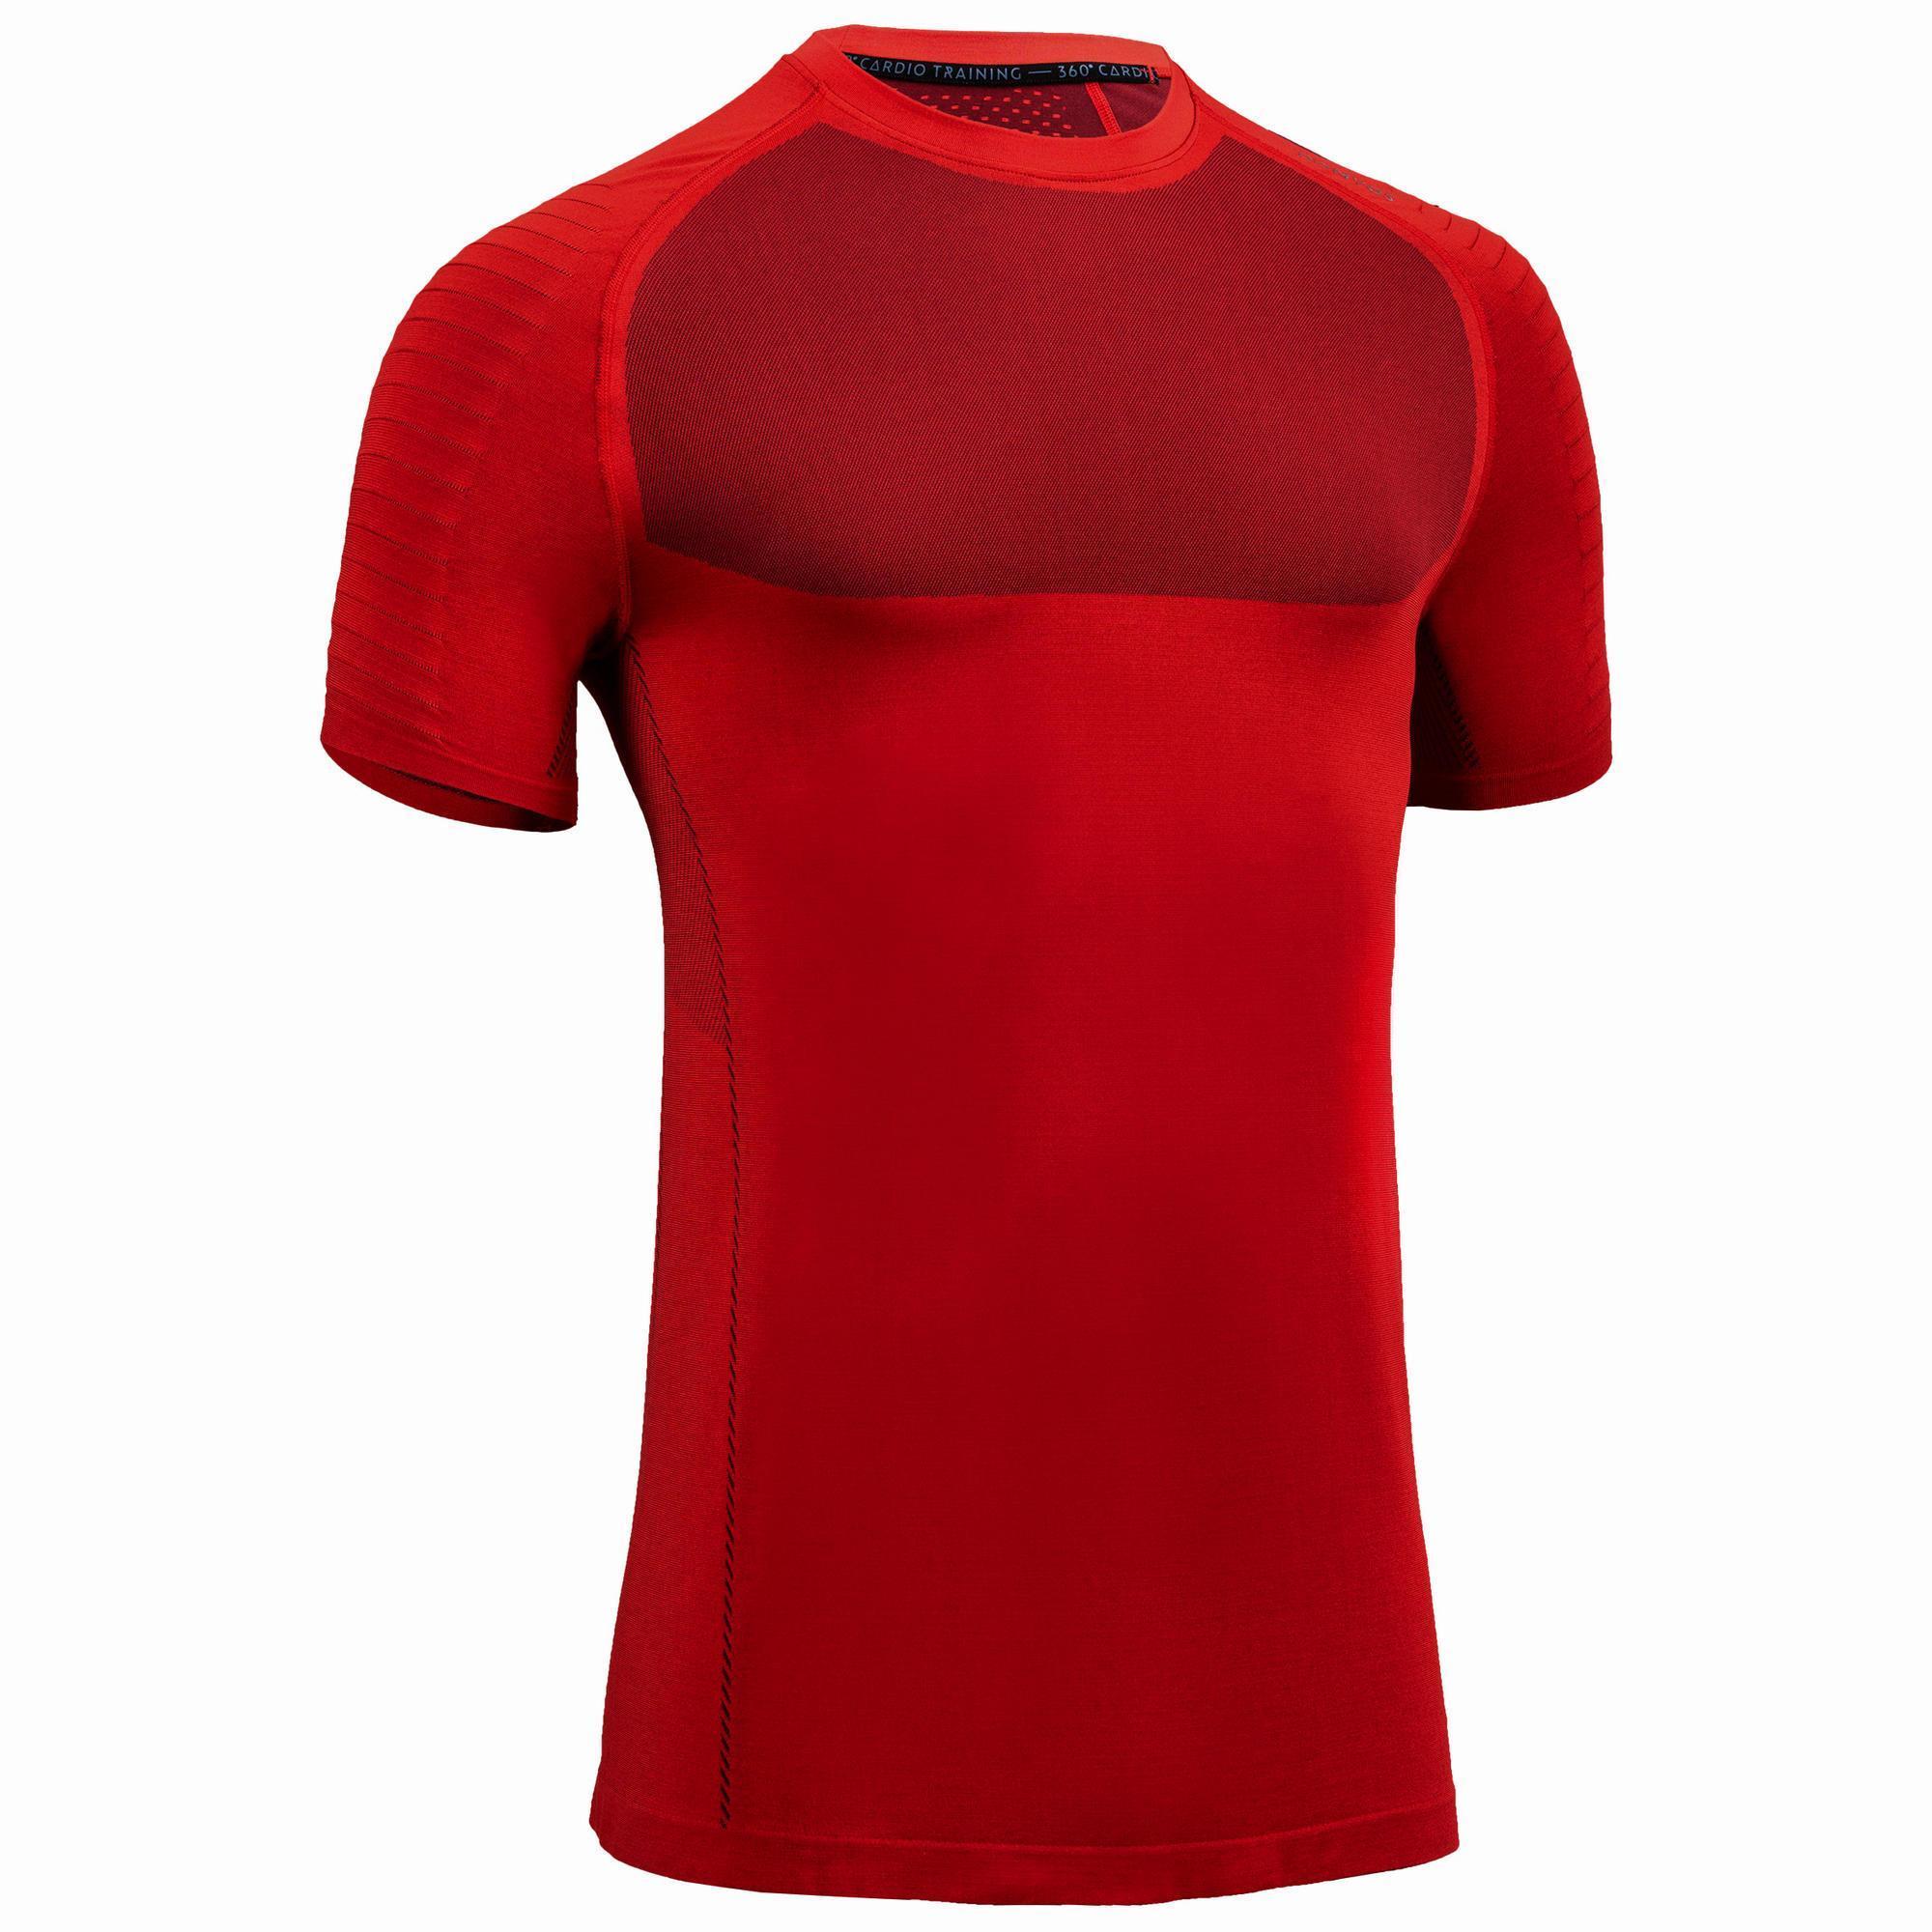 T-Shirt FTS 900 Fitness Cardio Herren rot | Sportbekleidung > Sportshirts > Poloshirts | Domyos